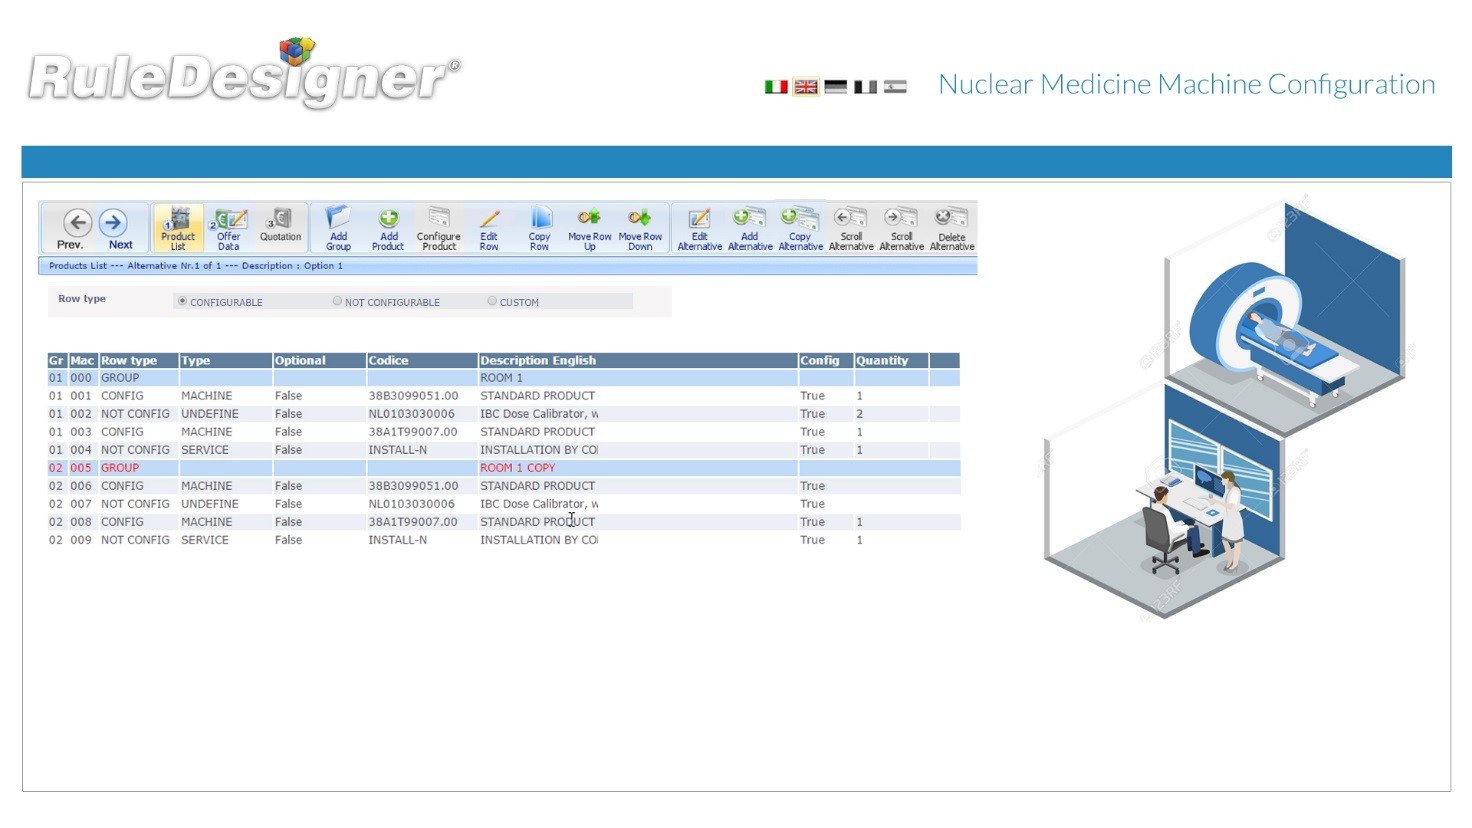 NuclearMedicineMachineConfiguration